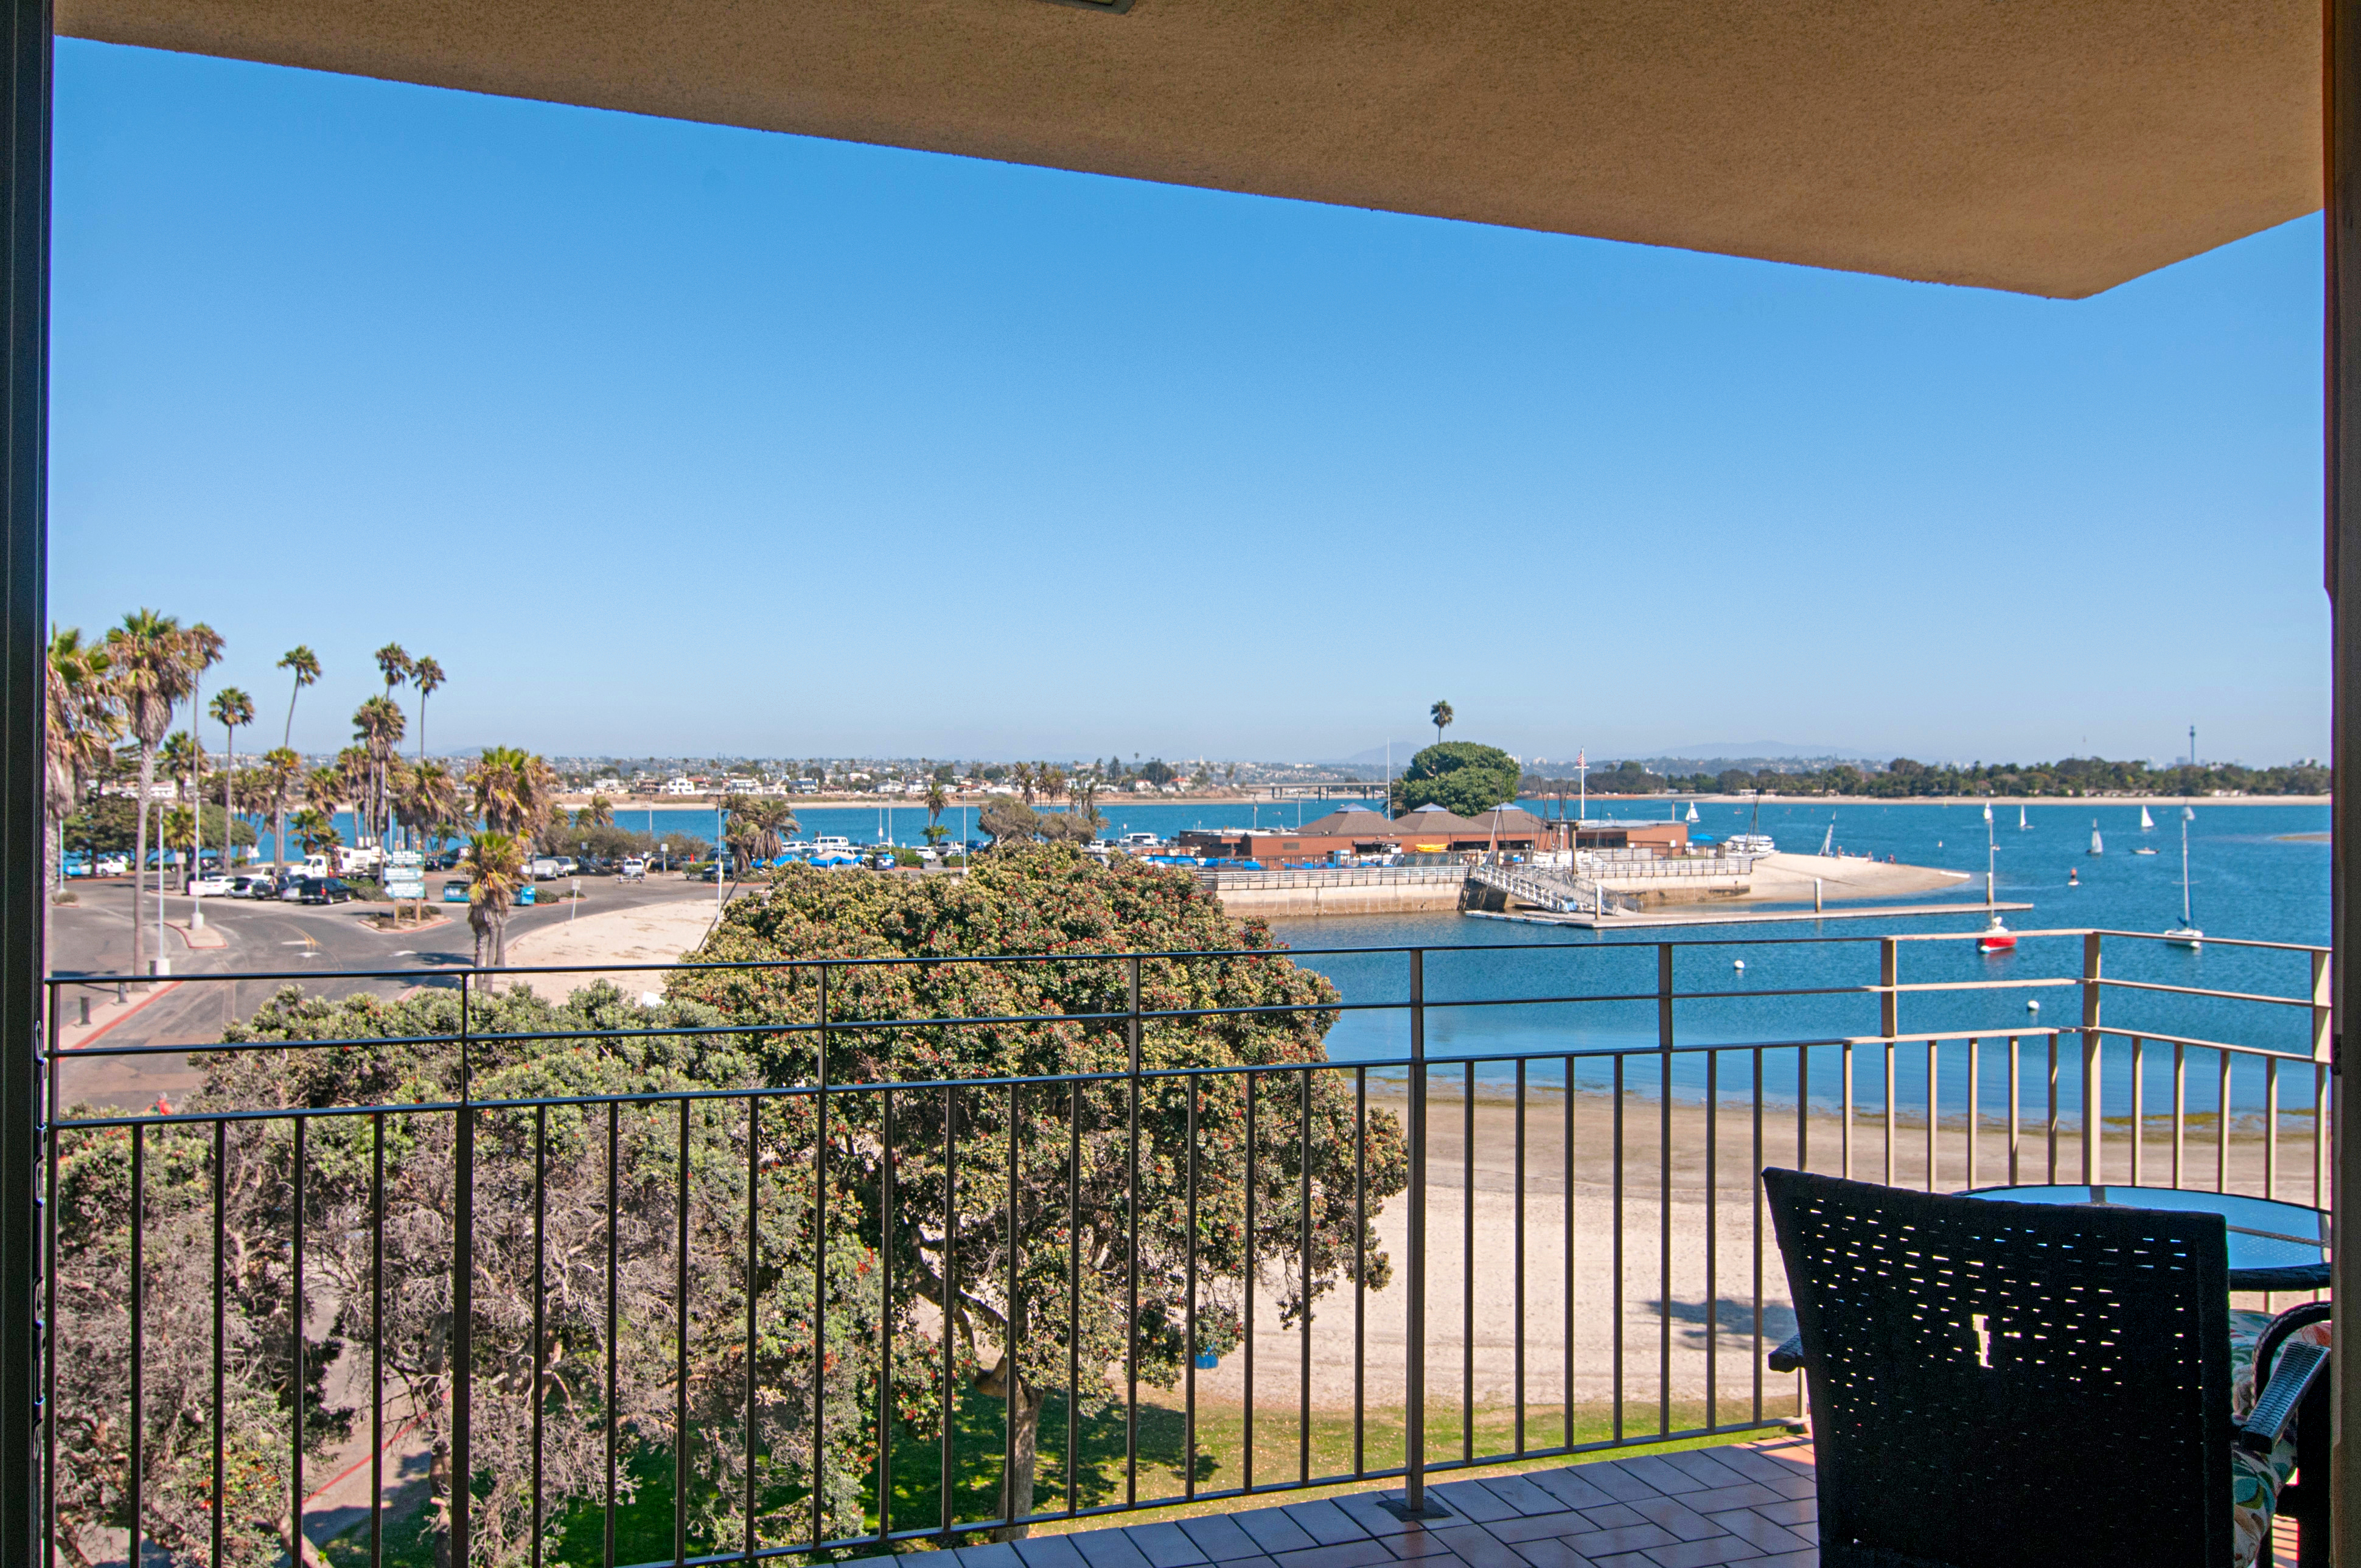 Mission Beach Condo W Bayside Views Ra91543 Redawning